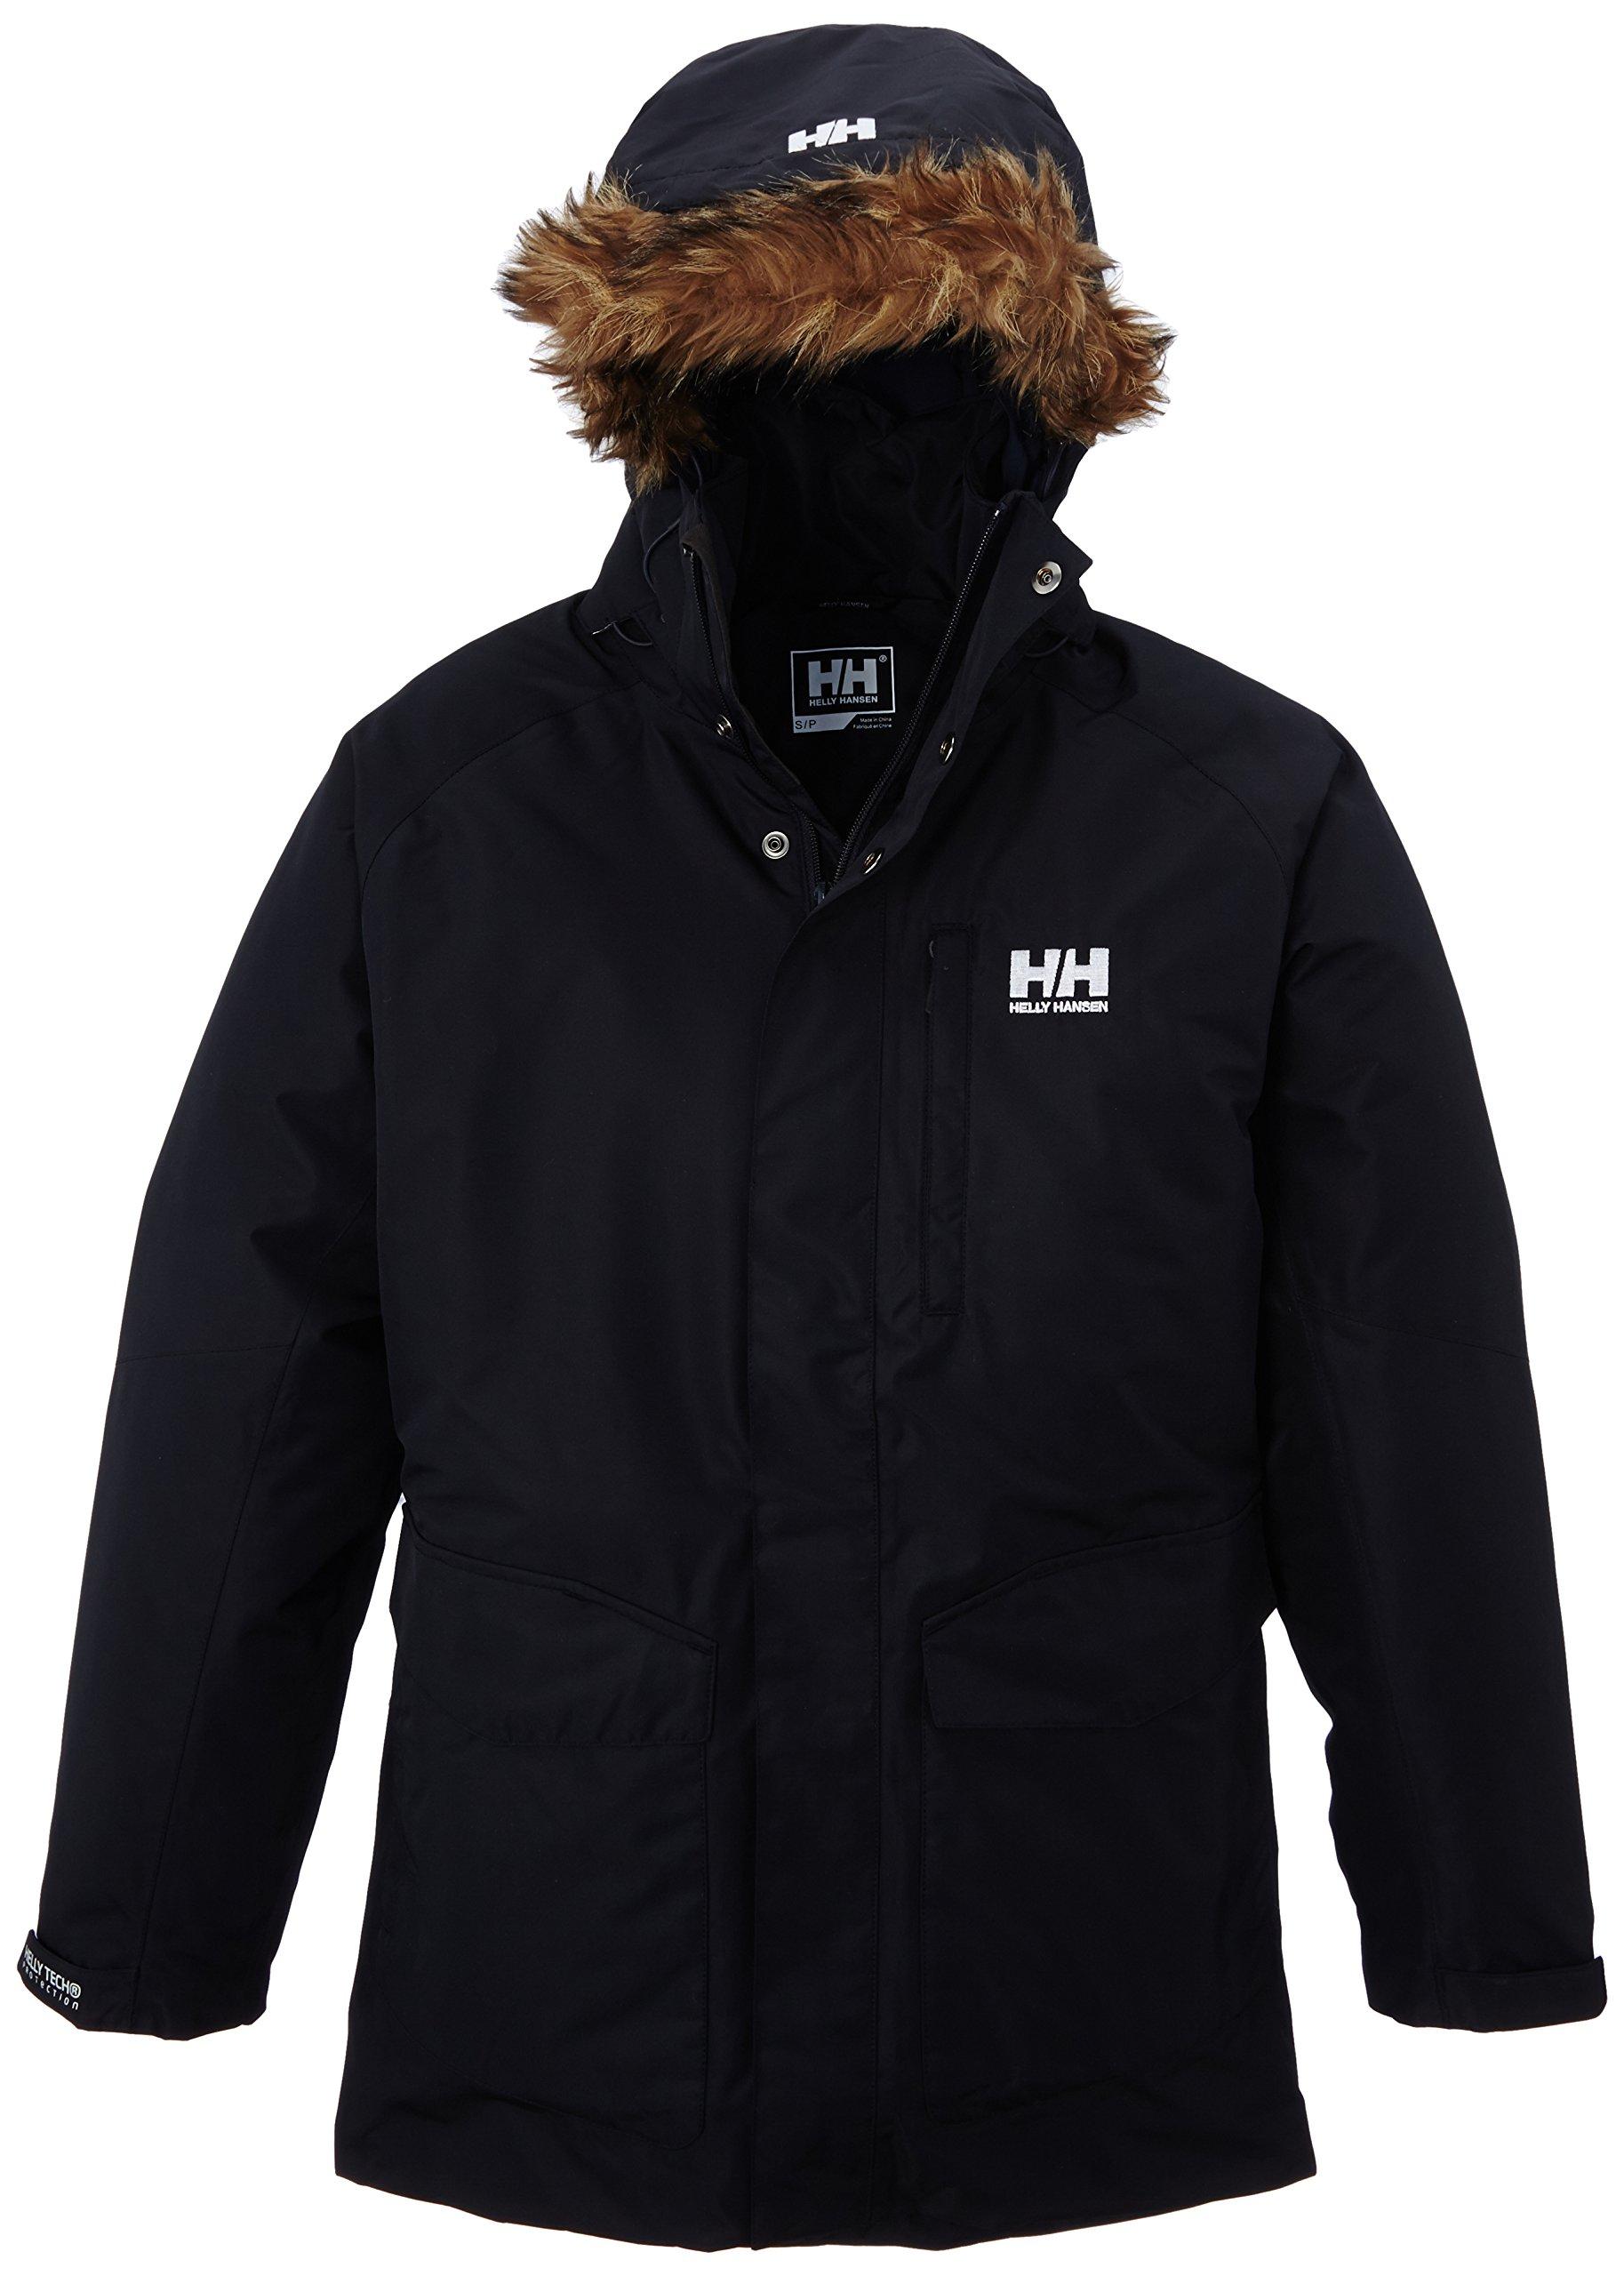 Helly Hansen Men's Dubliner Parka 100 Gram Primaloft Insulated Waterproof Windproof Breathable Rain Coat with Hood, 598 Navy, X-Large by Helly Hansen